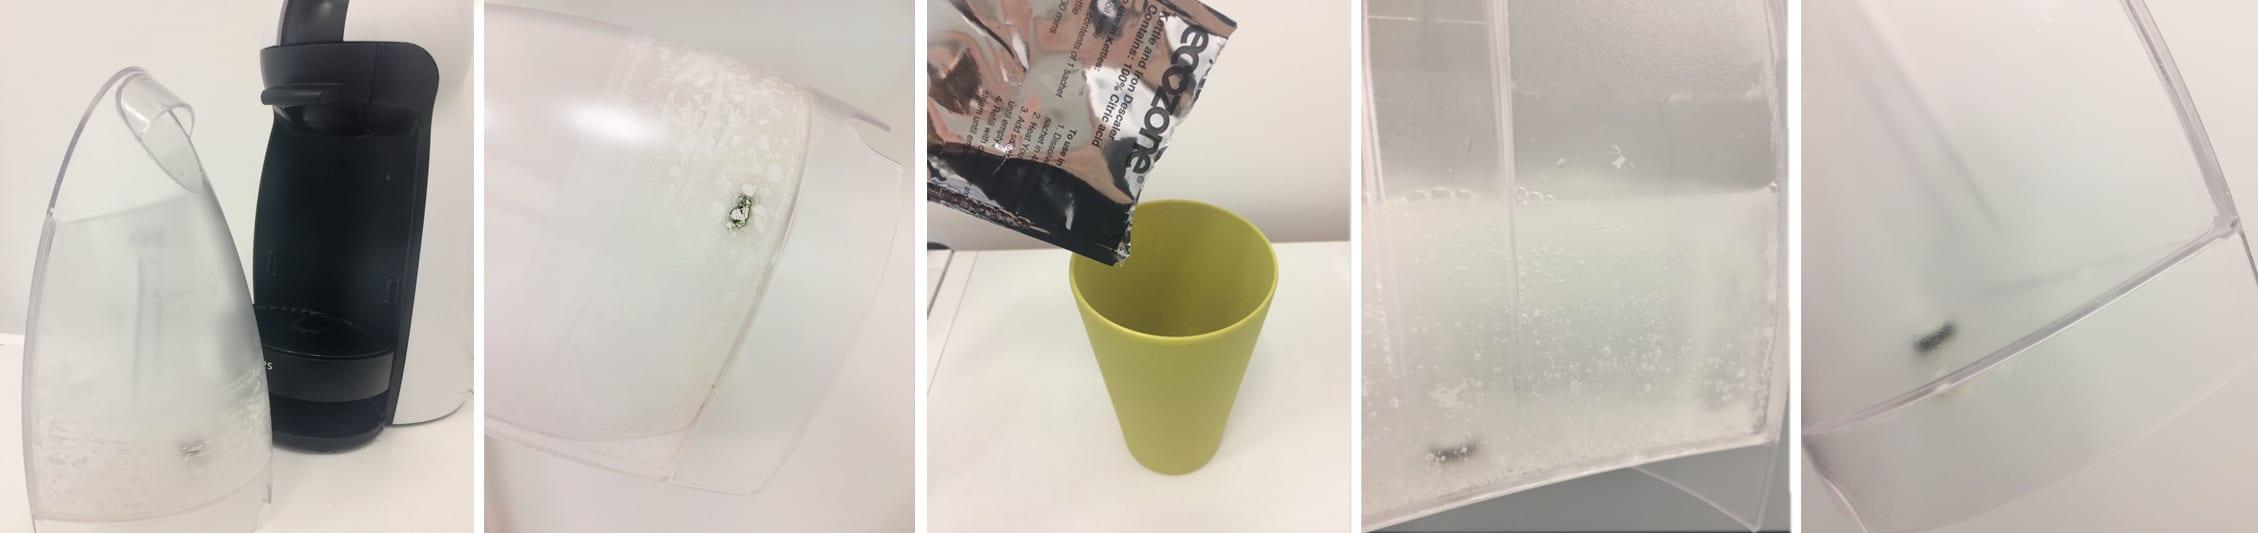 ciscenje-kavomata